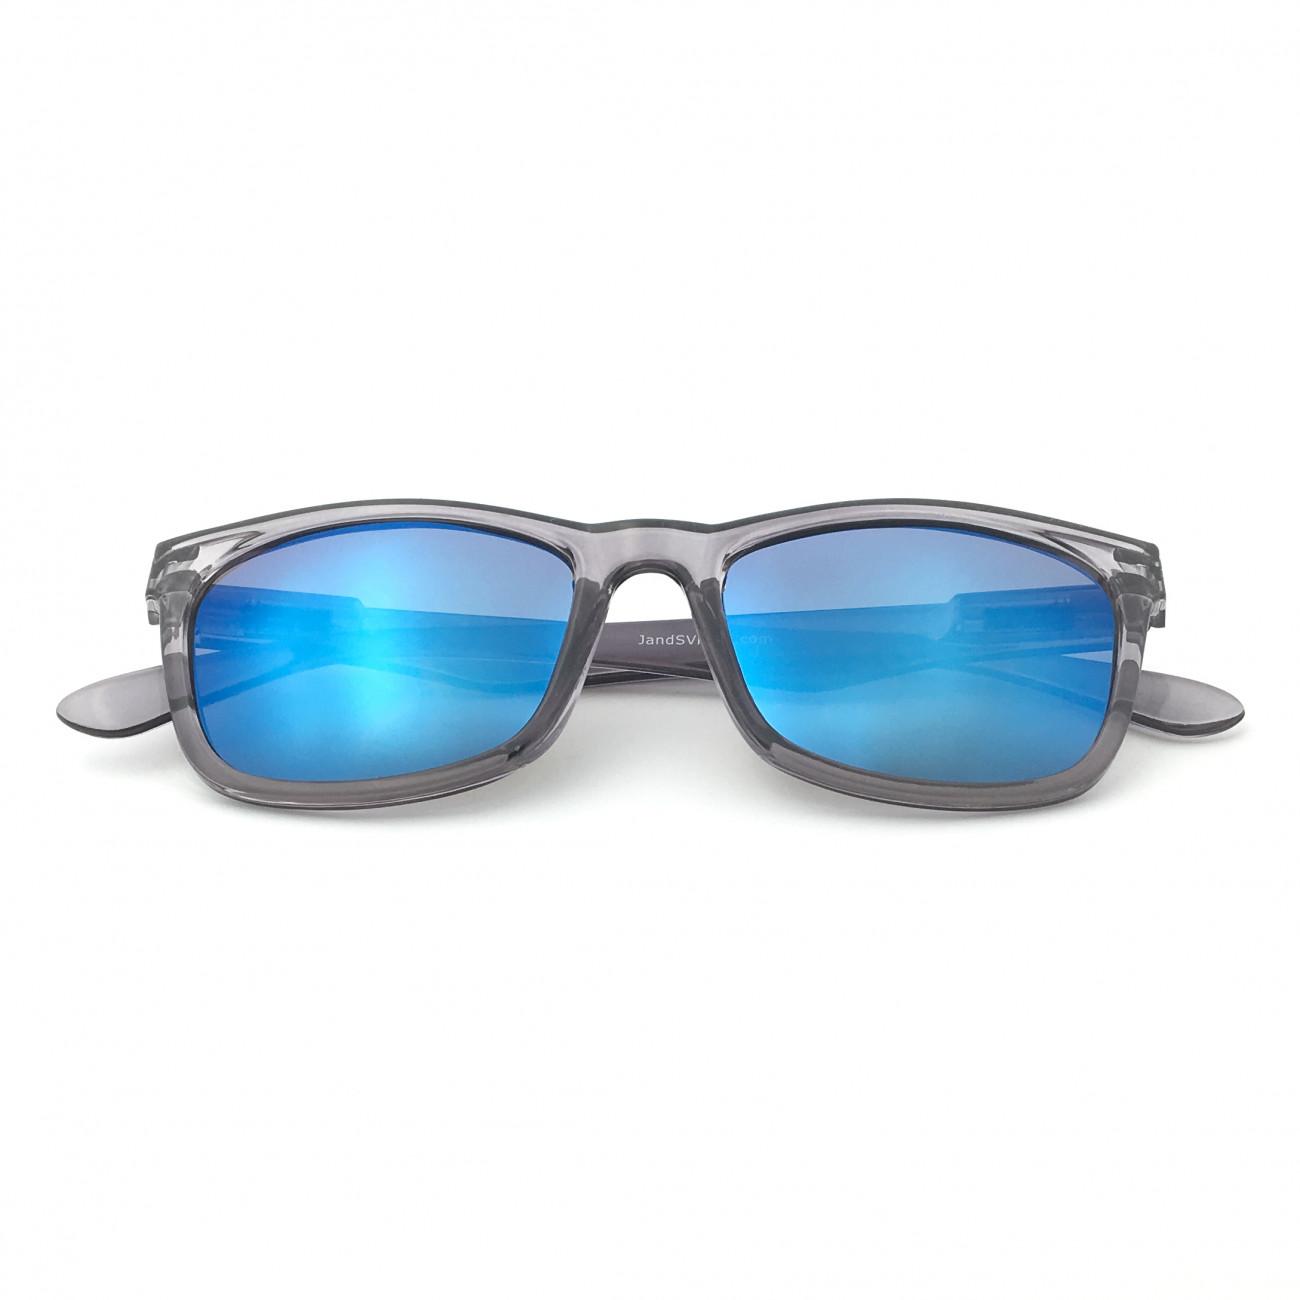 66ef2e1316 J+S Classic 80 s Wayfarer Mark II Sunglasses